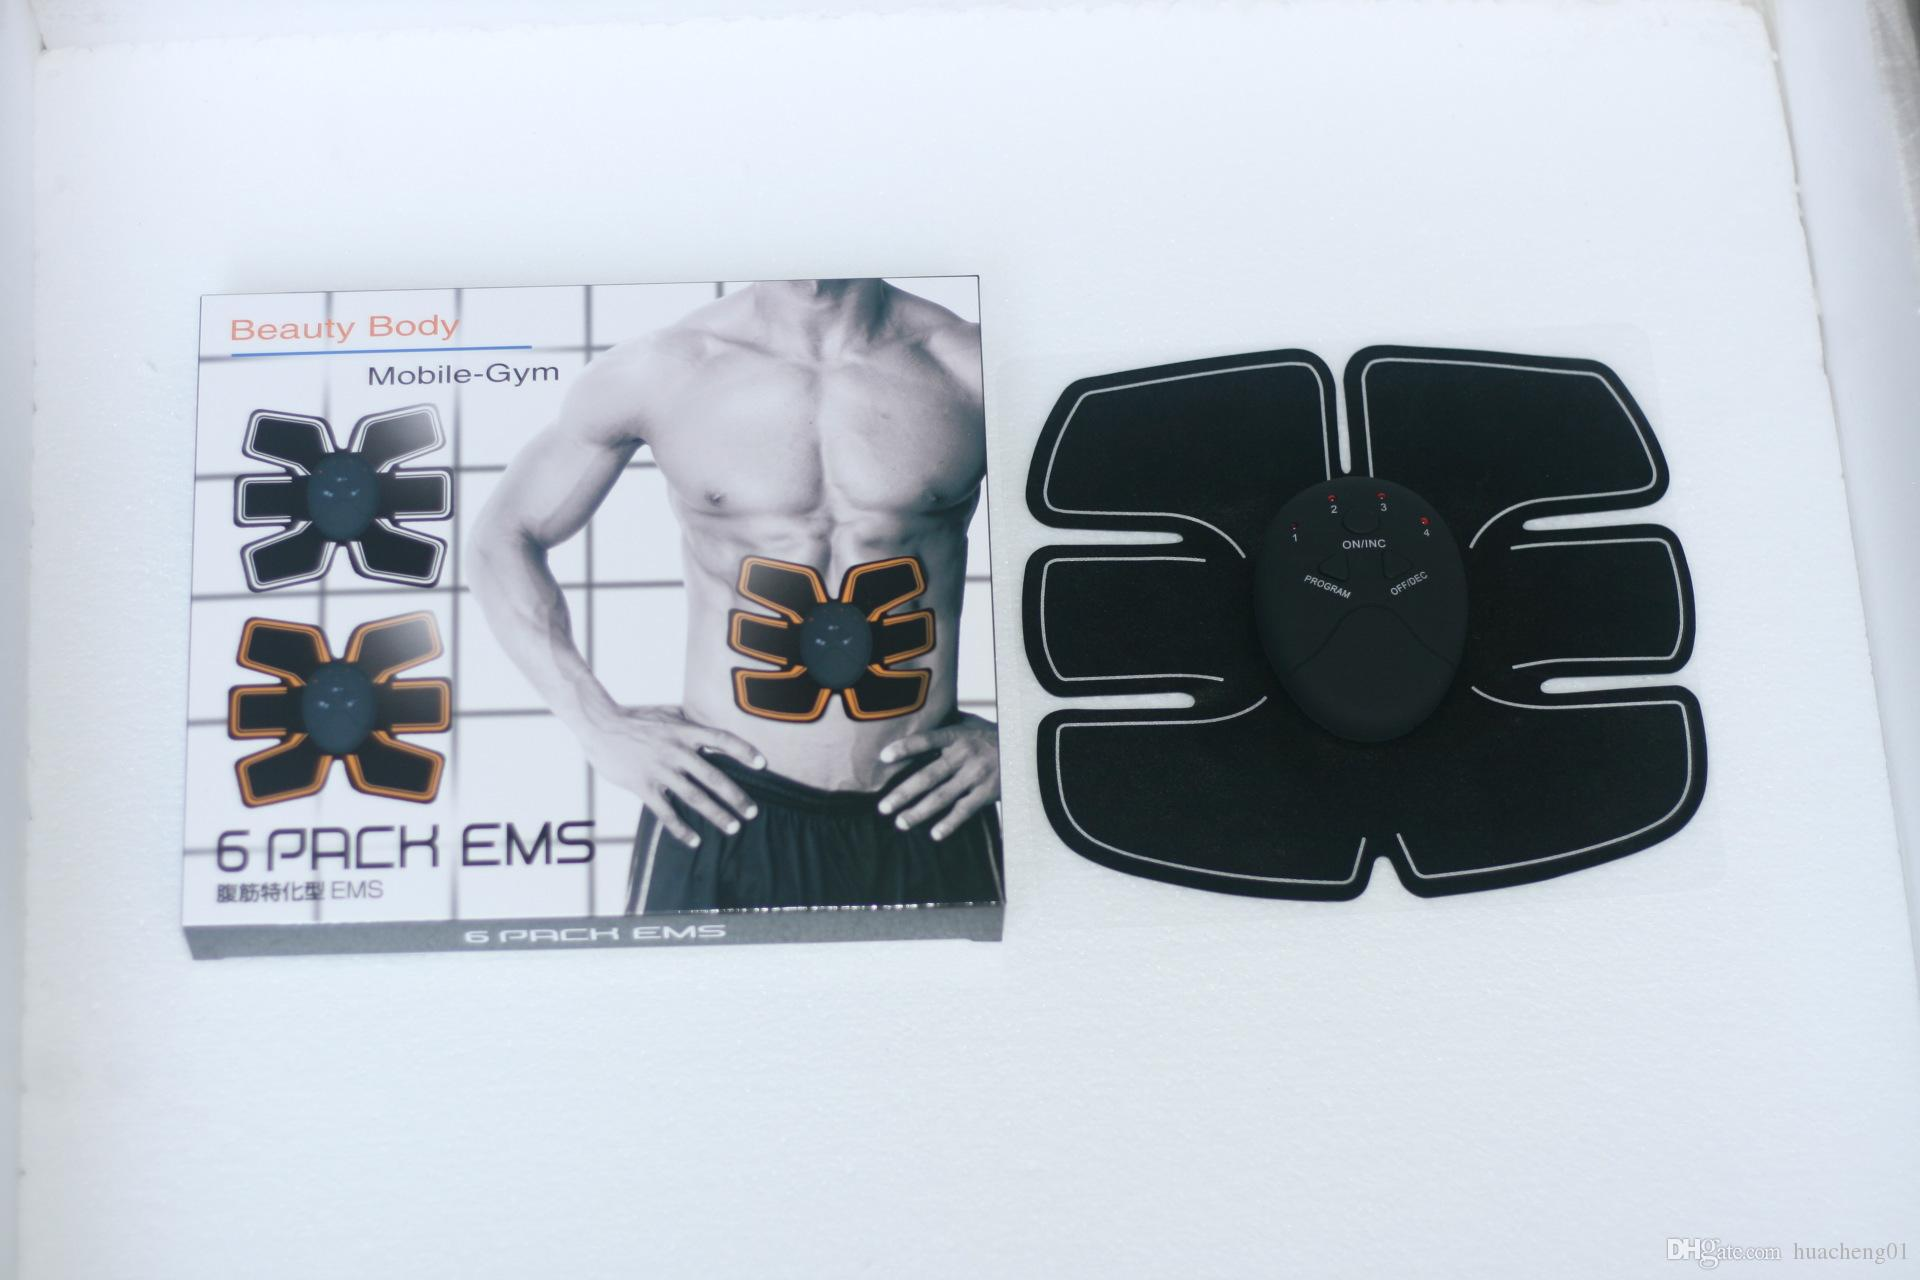 EMS Fernbedienung Bauchmuskeltrainer Smart Body Building Fitness Abs